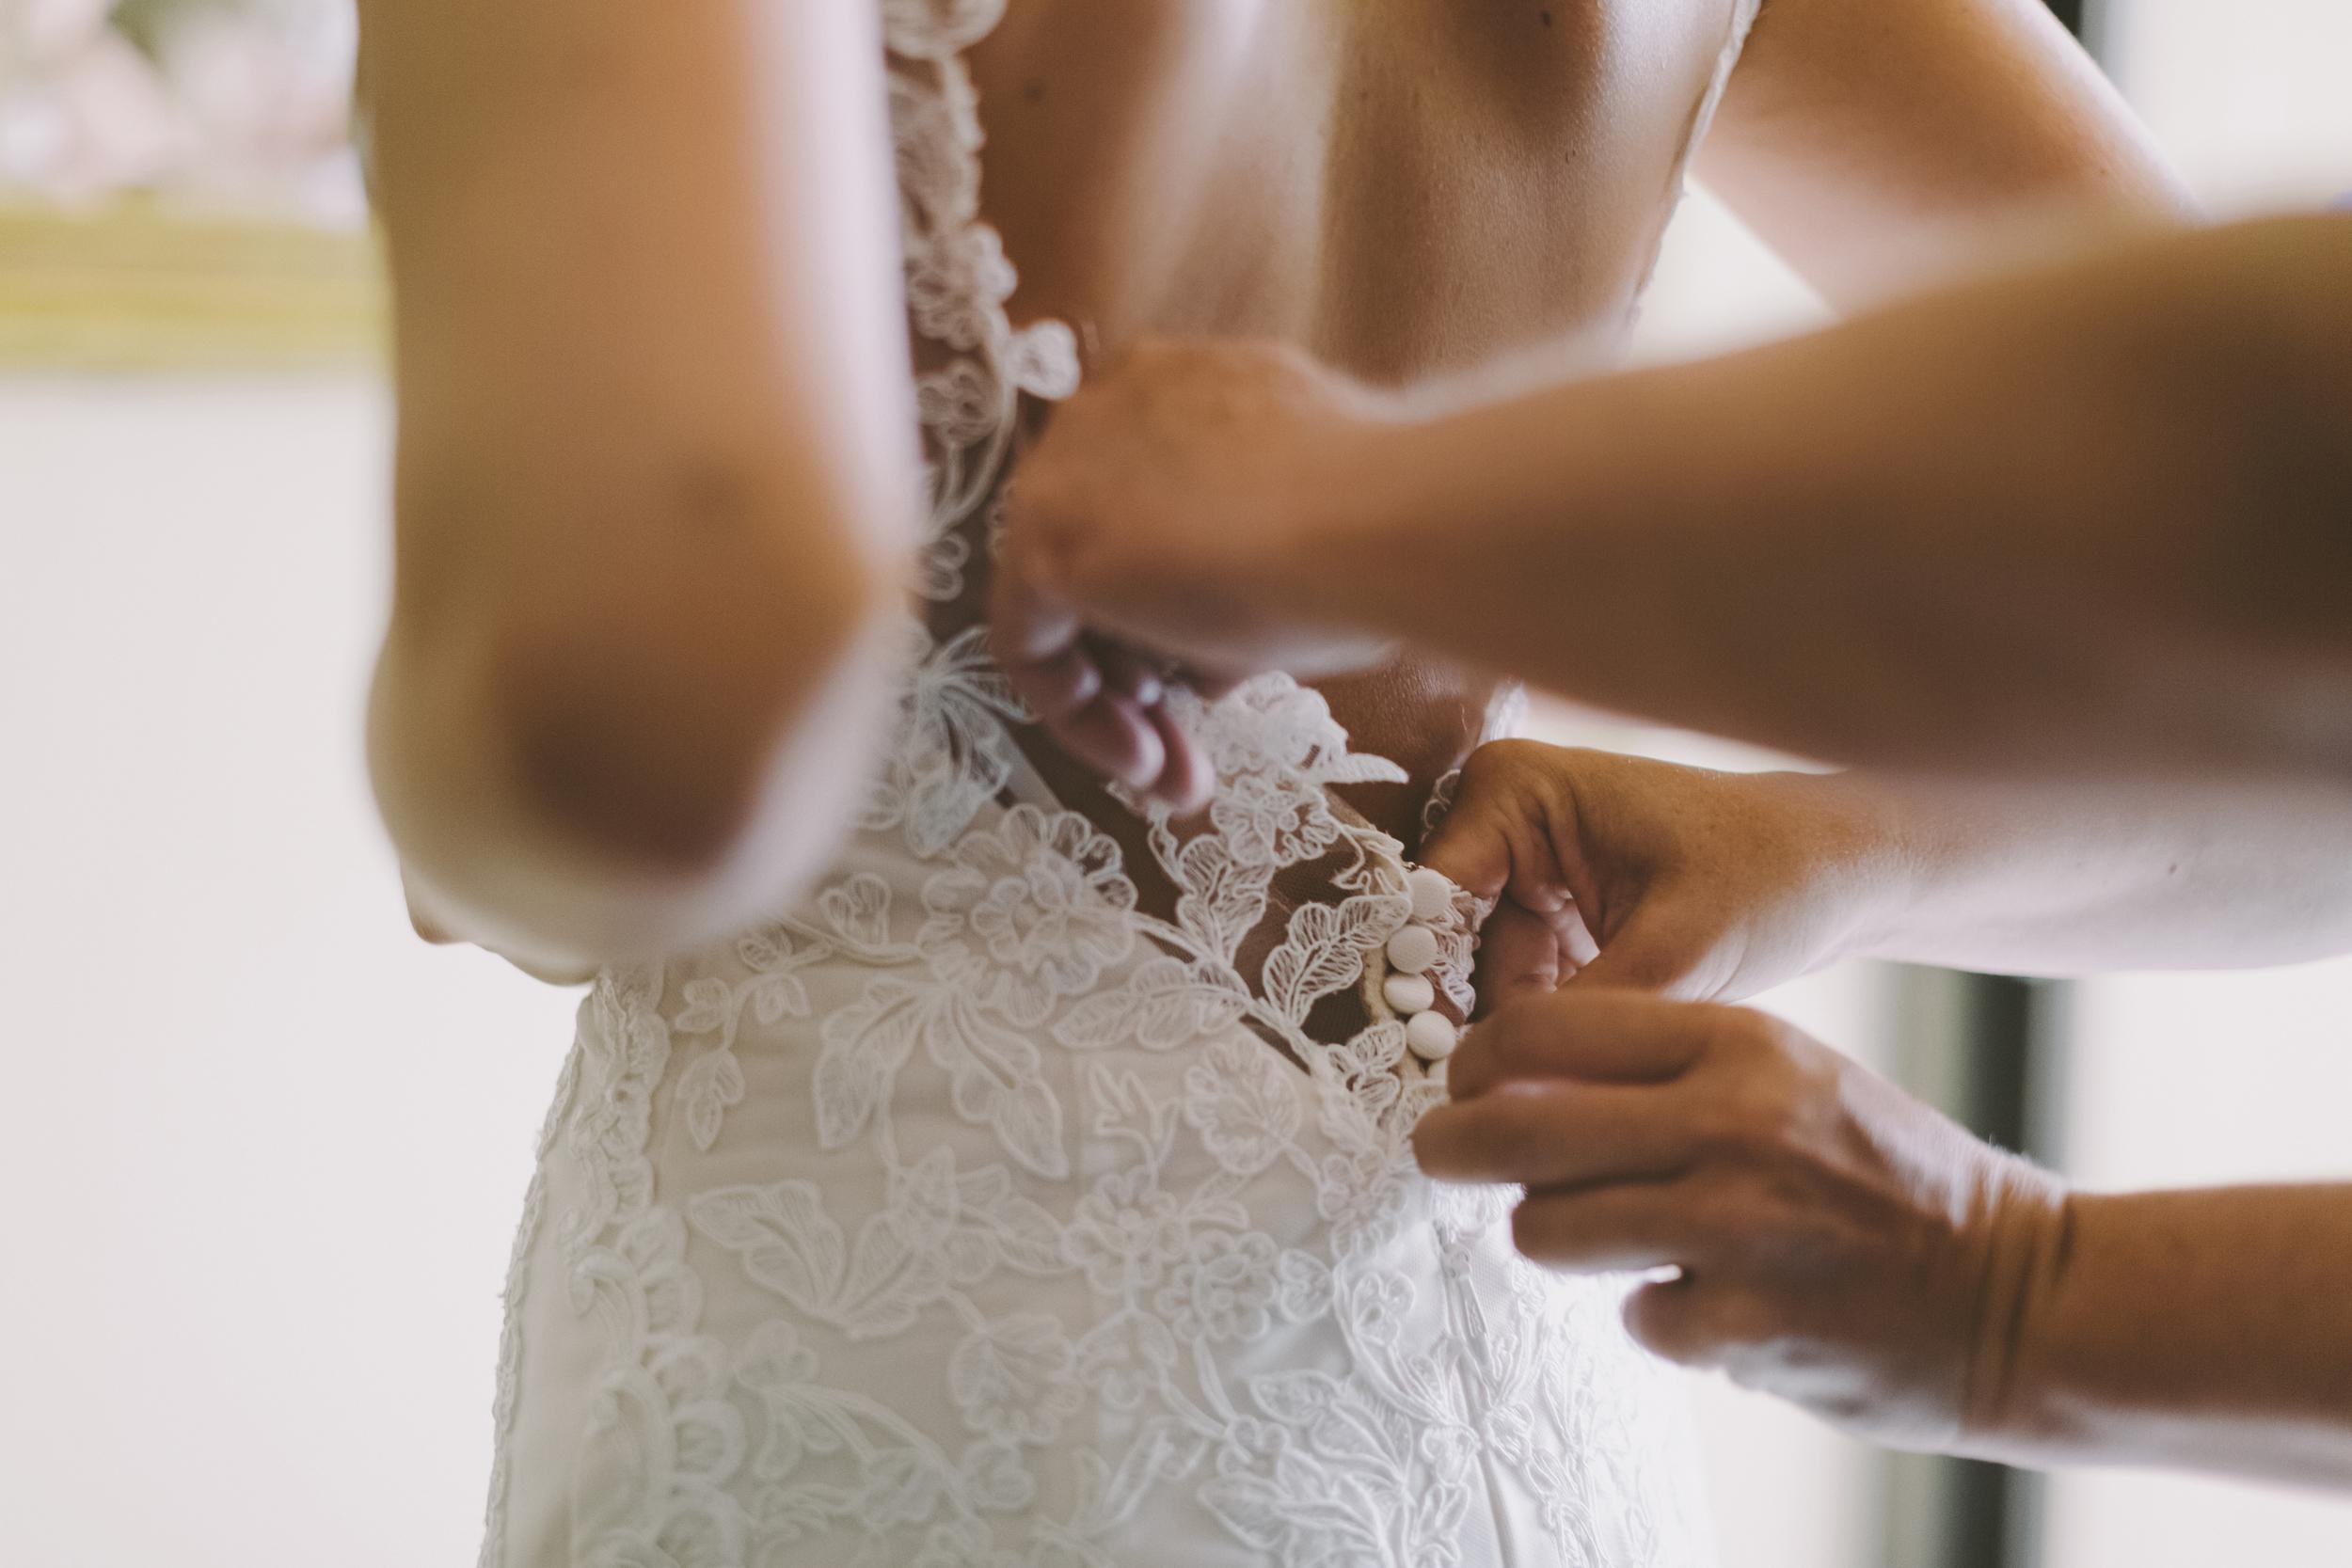 angie-diaz-photography-hawaii-wedding-photographer-kelli-jay-15.jpg